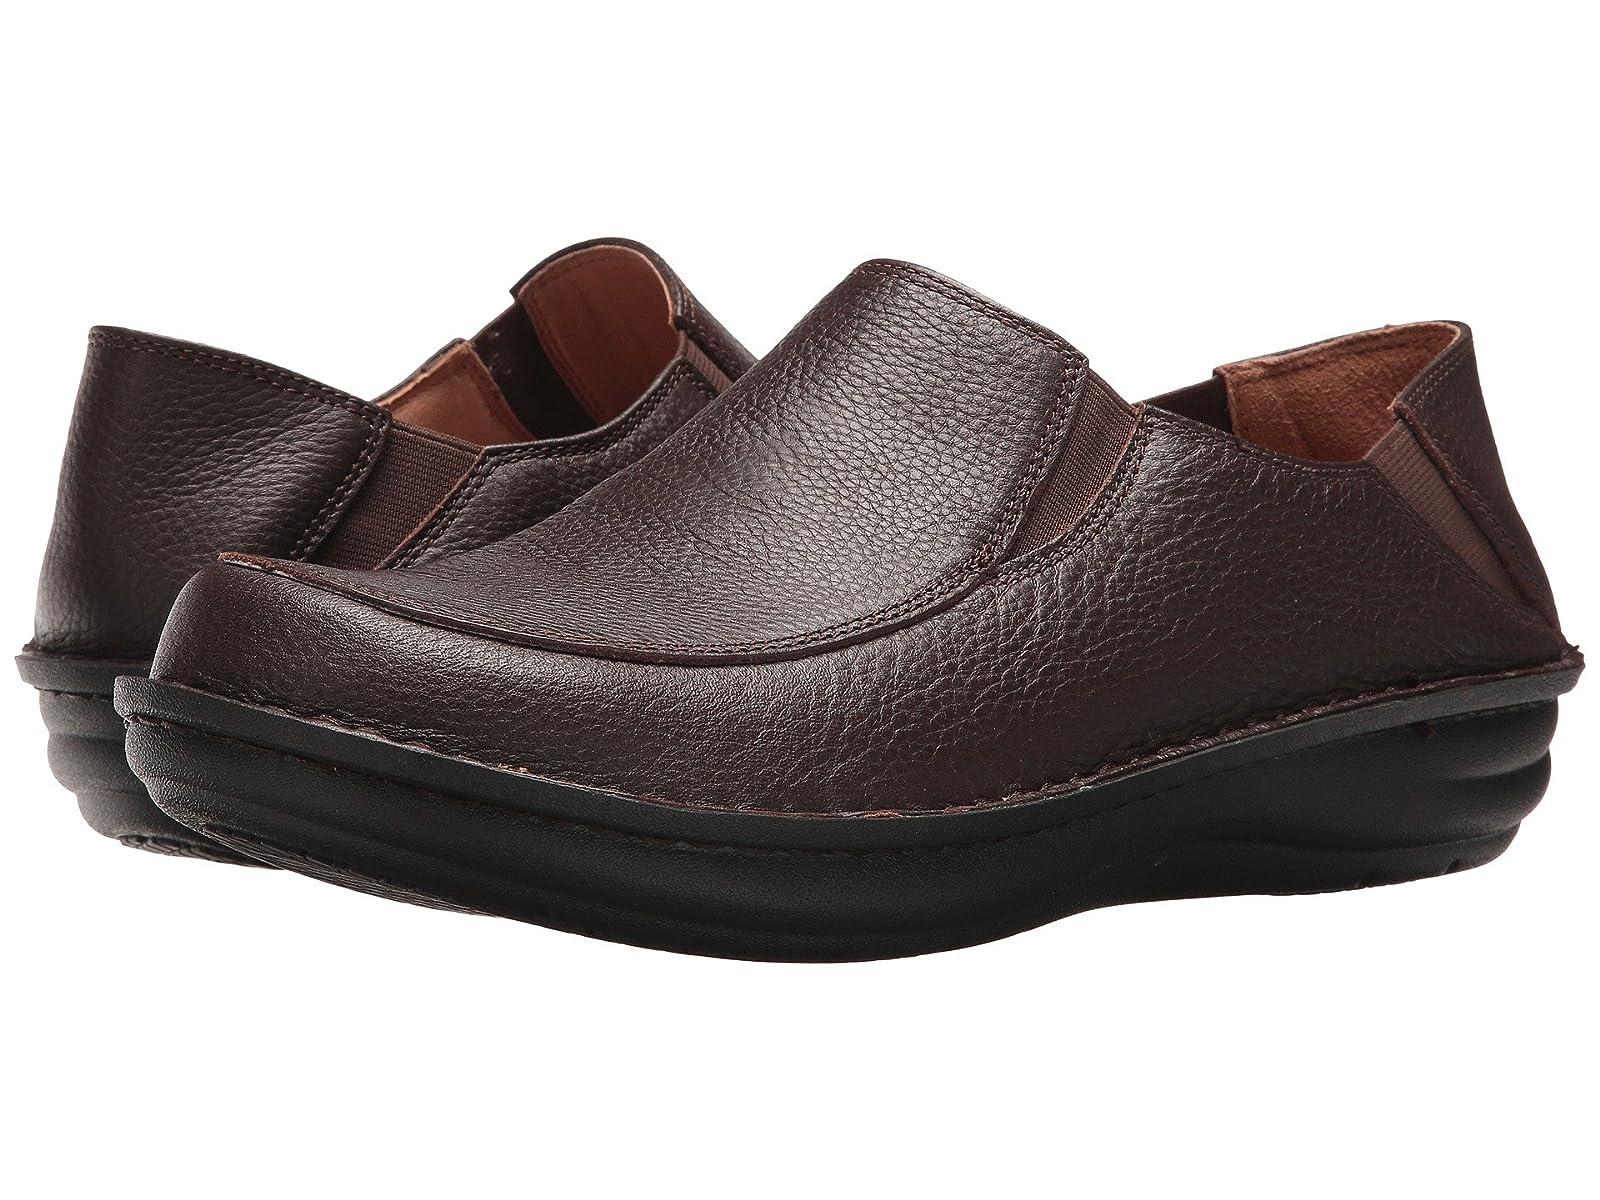 Alegria SchusterCheap and distinctive eye-catching shoes